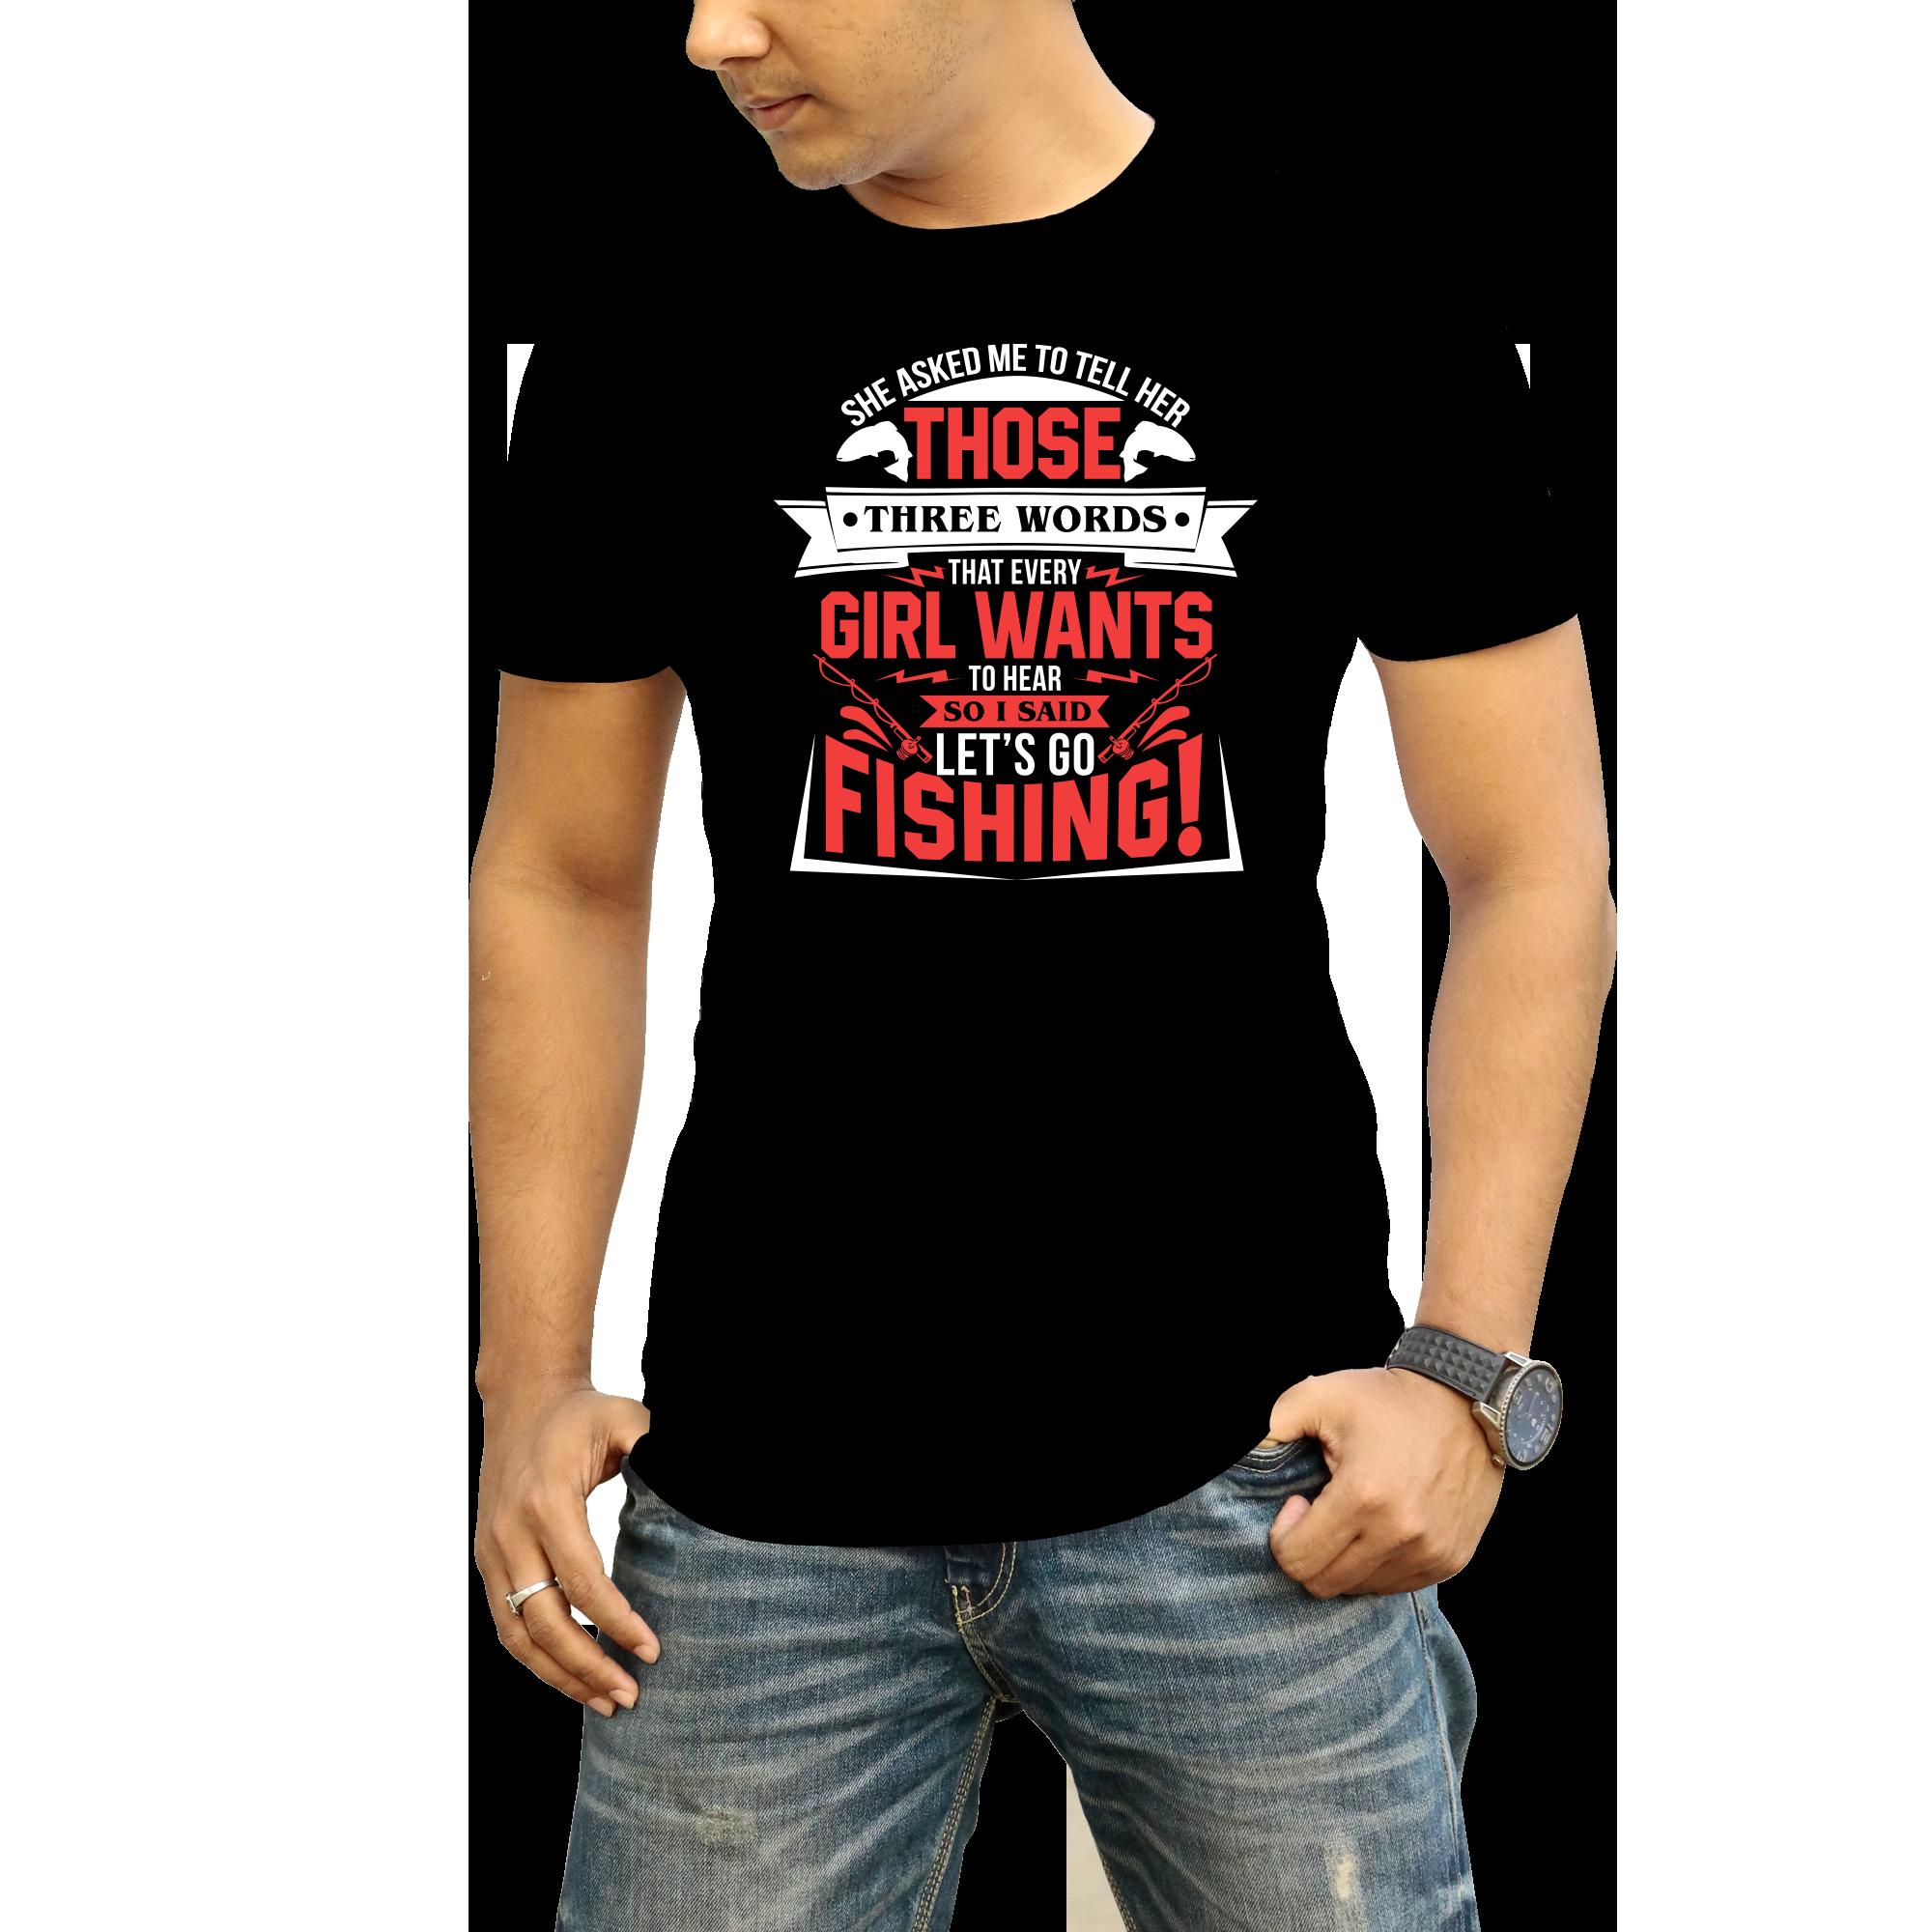 I will make fishing T-shirt design